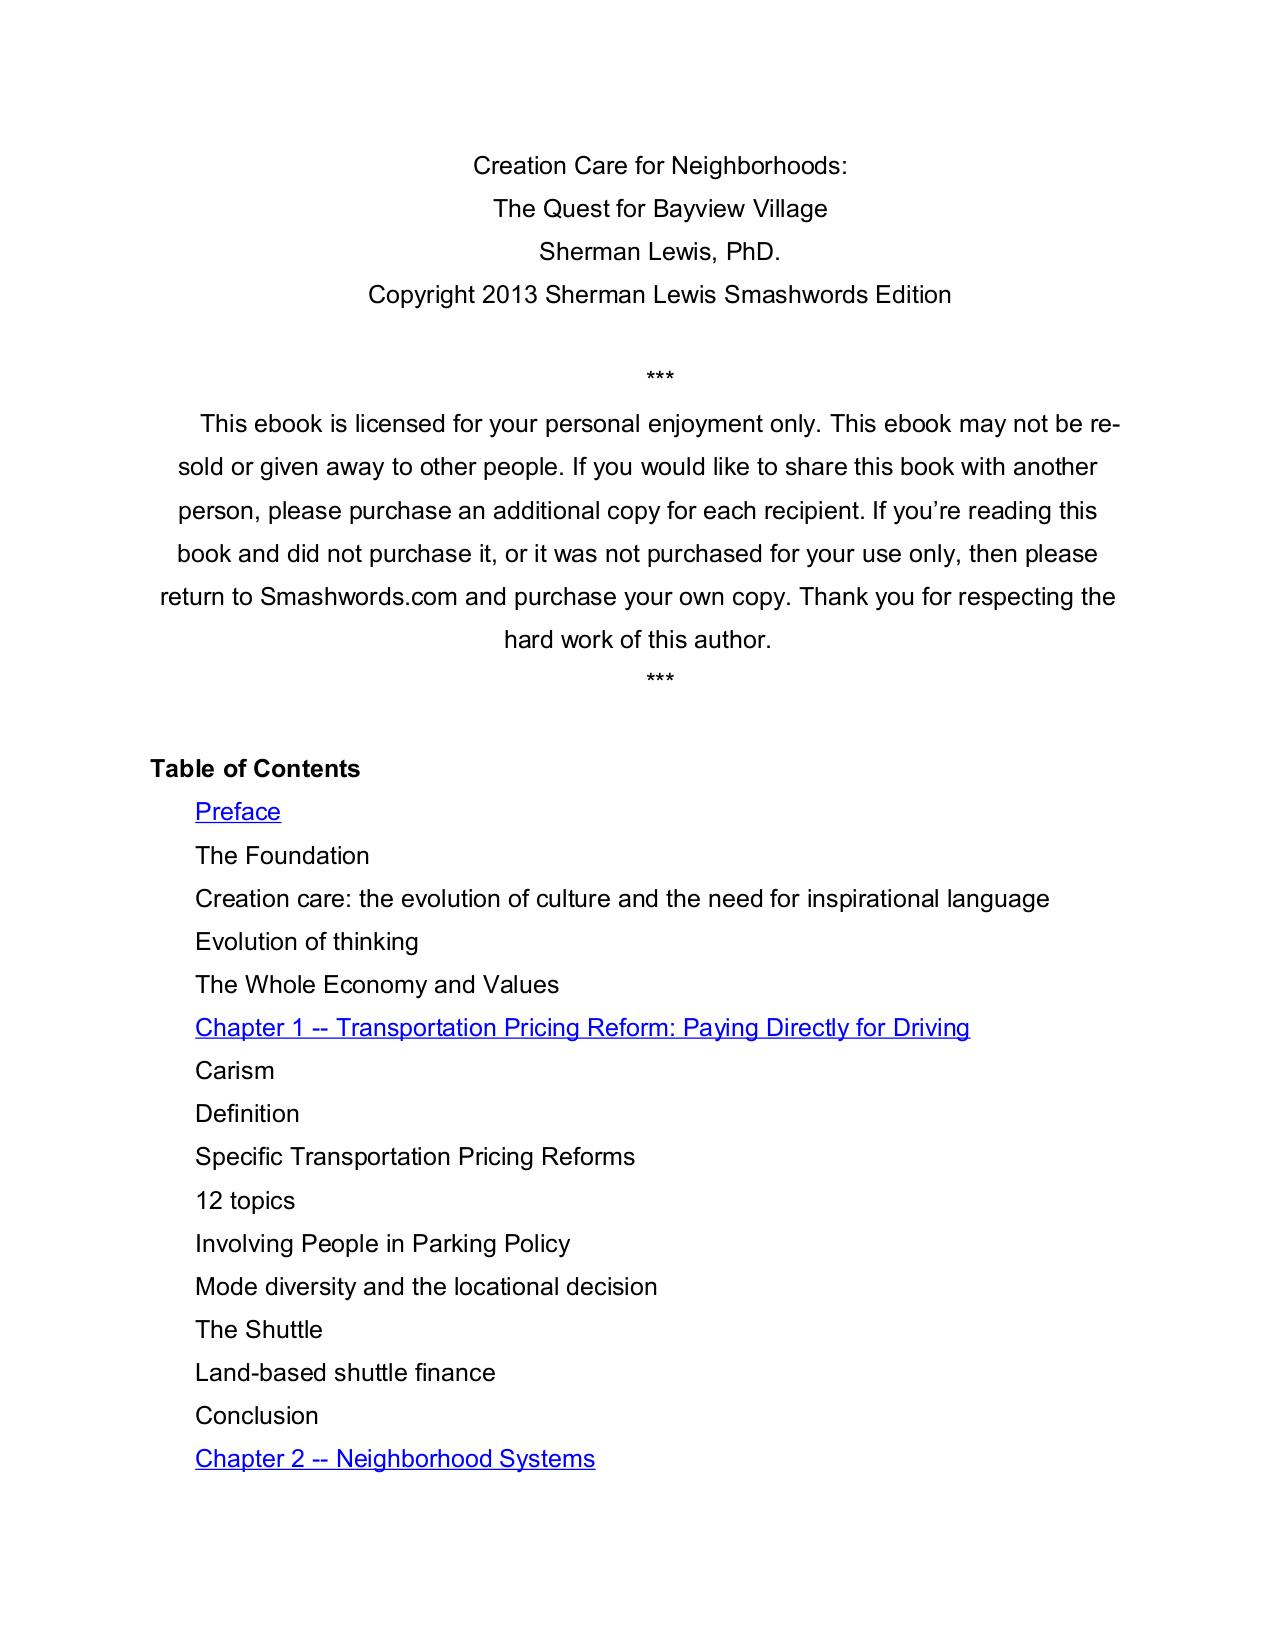 pdf for LG Vacuum LuV300 manual